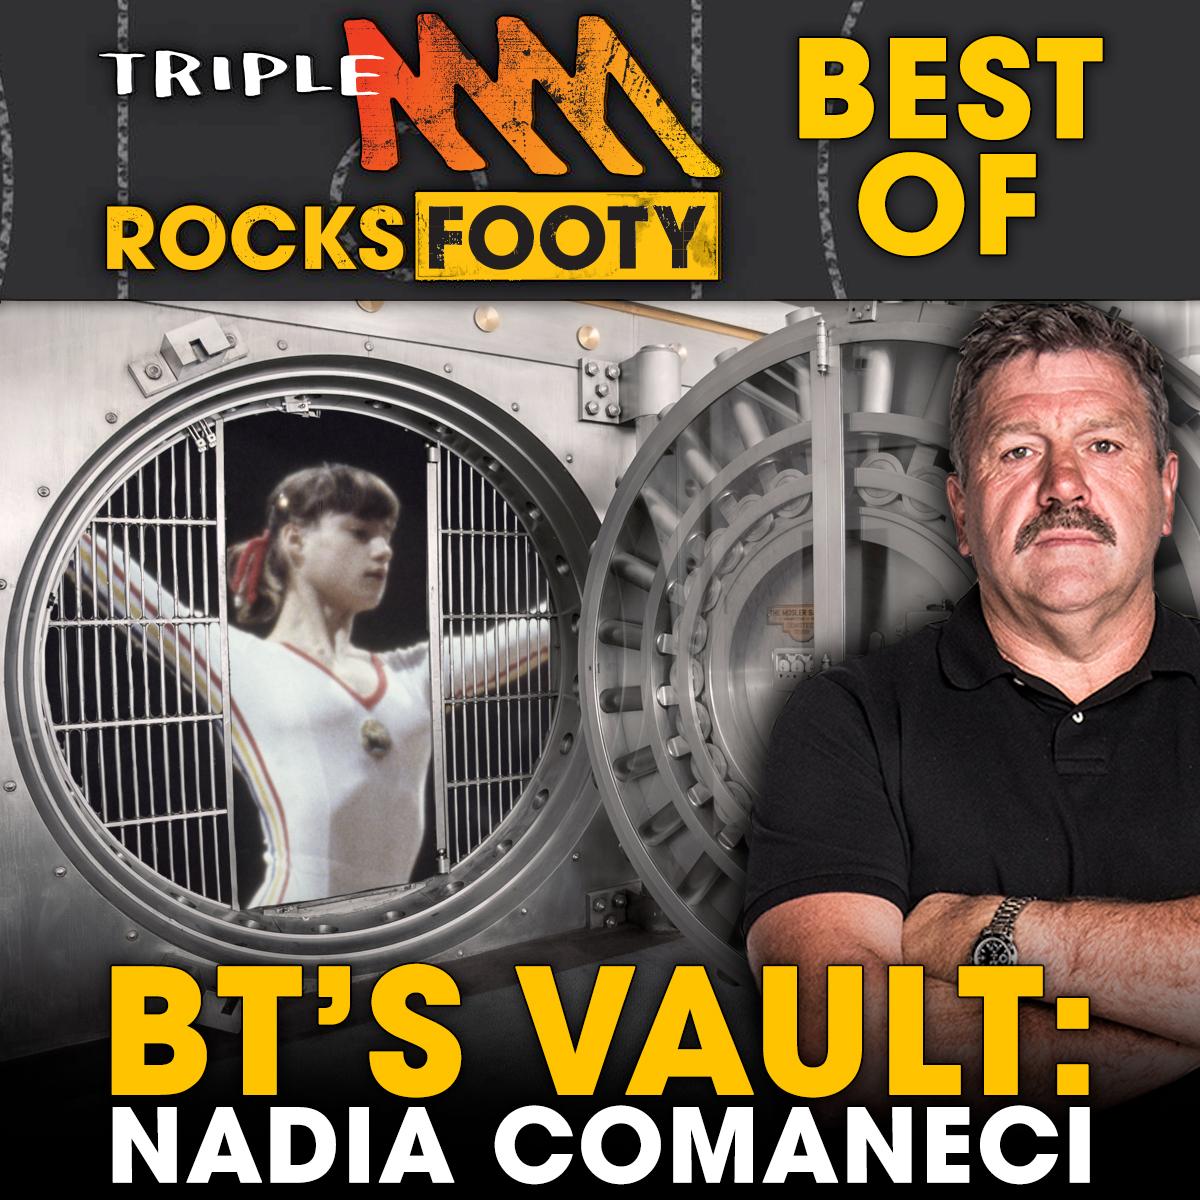 BT's Vault: Nadia Comaneci